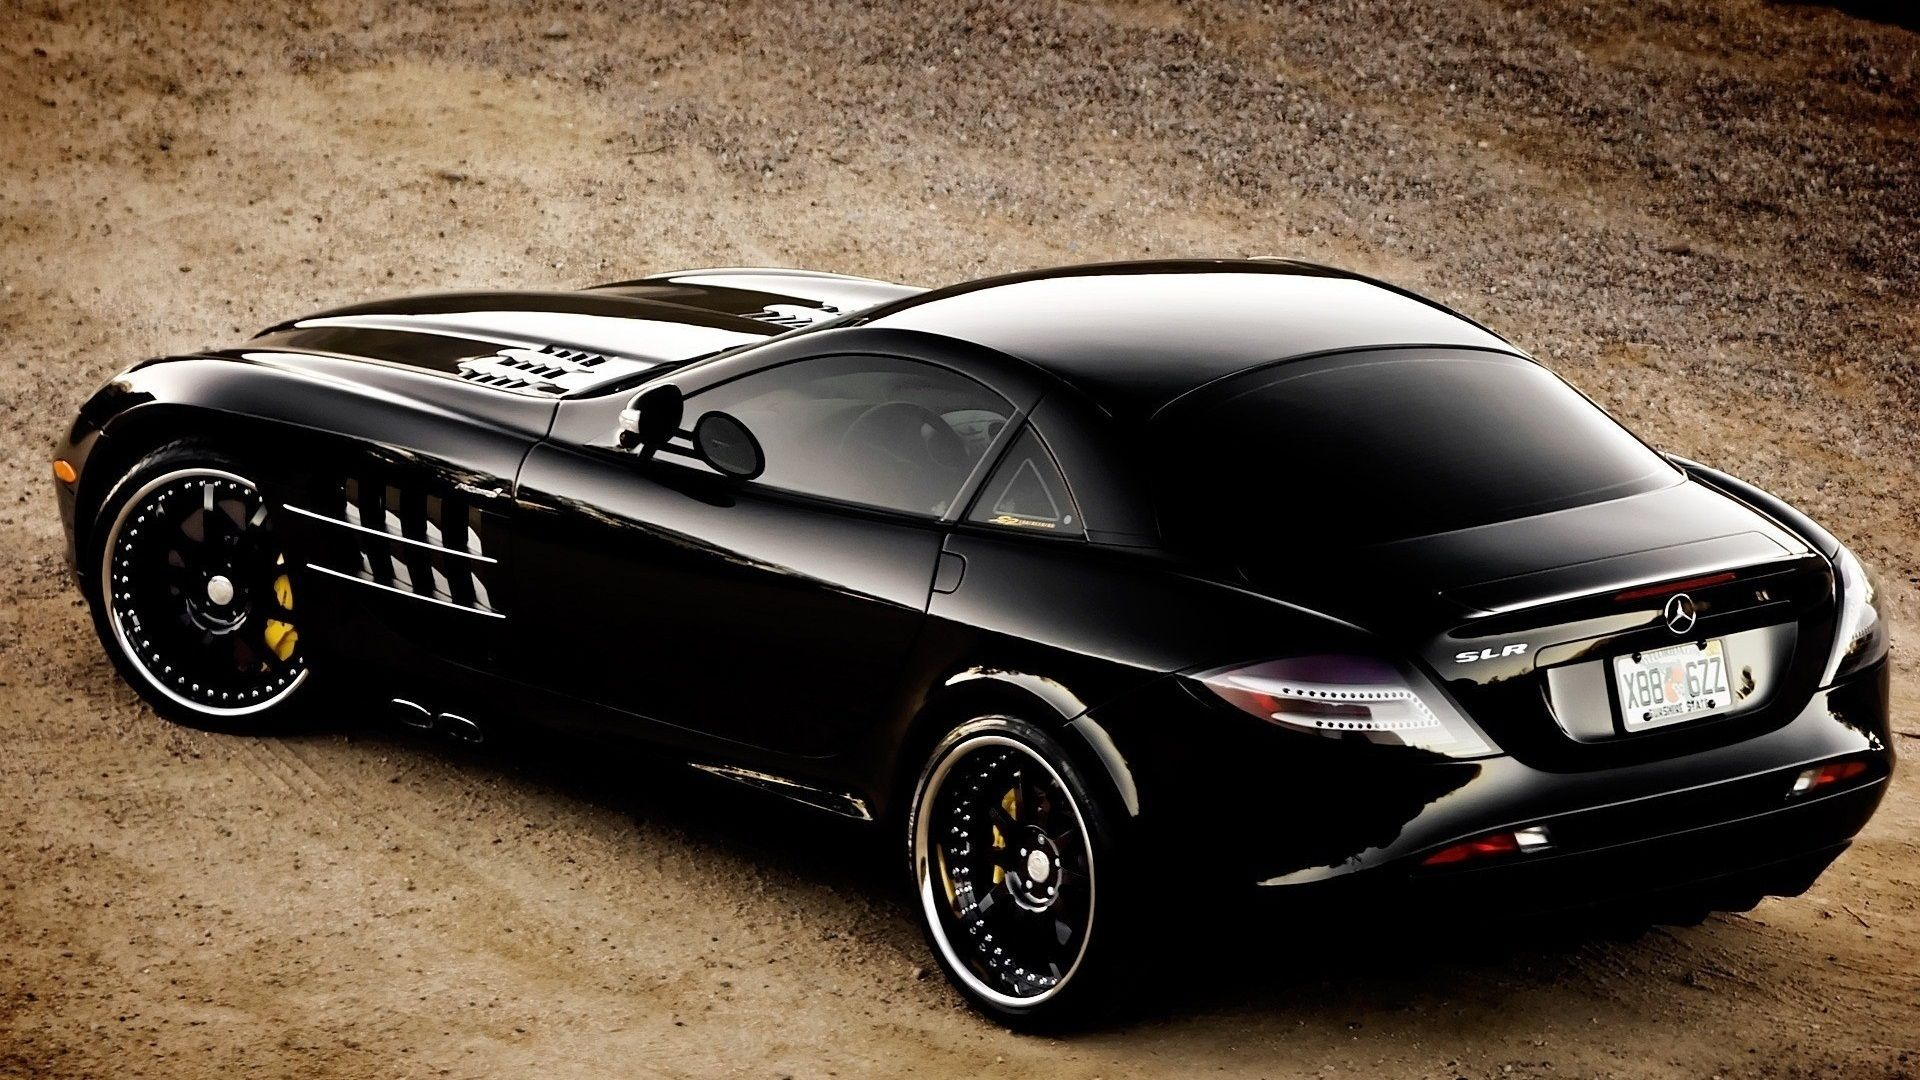 Mercedes Benz Slr Mclaren Black Convertible Mercedes-Benz SLR McLa...